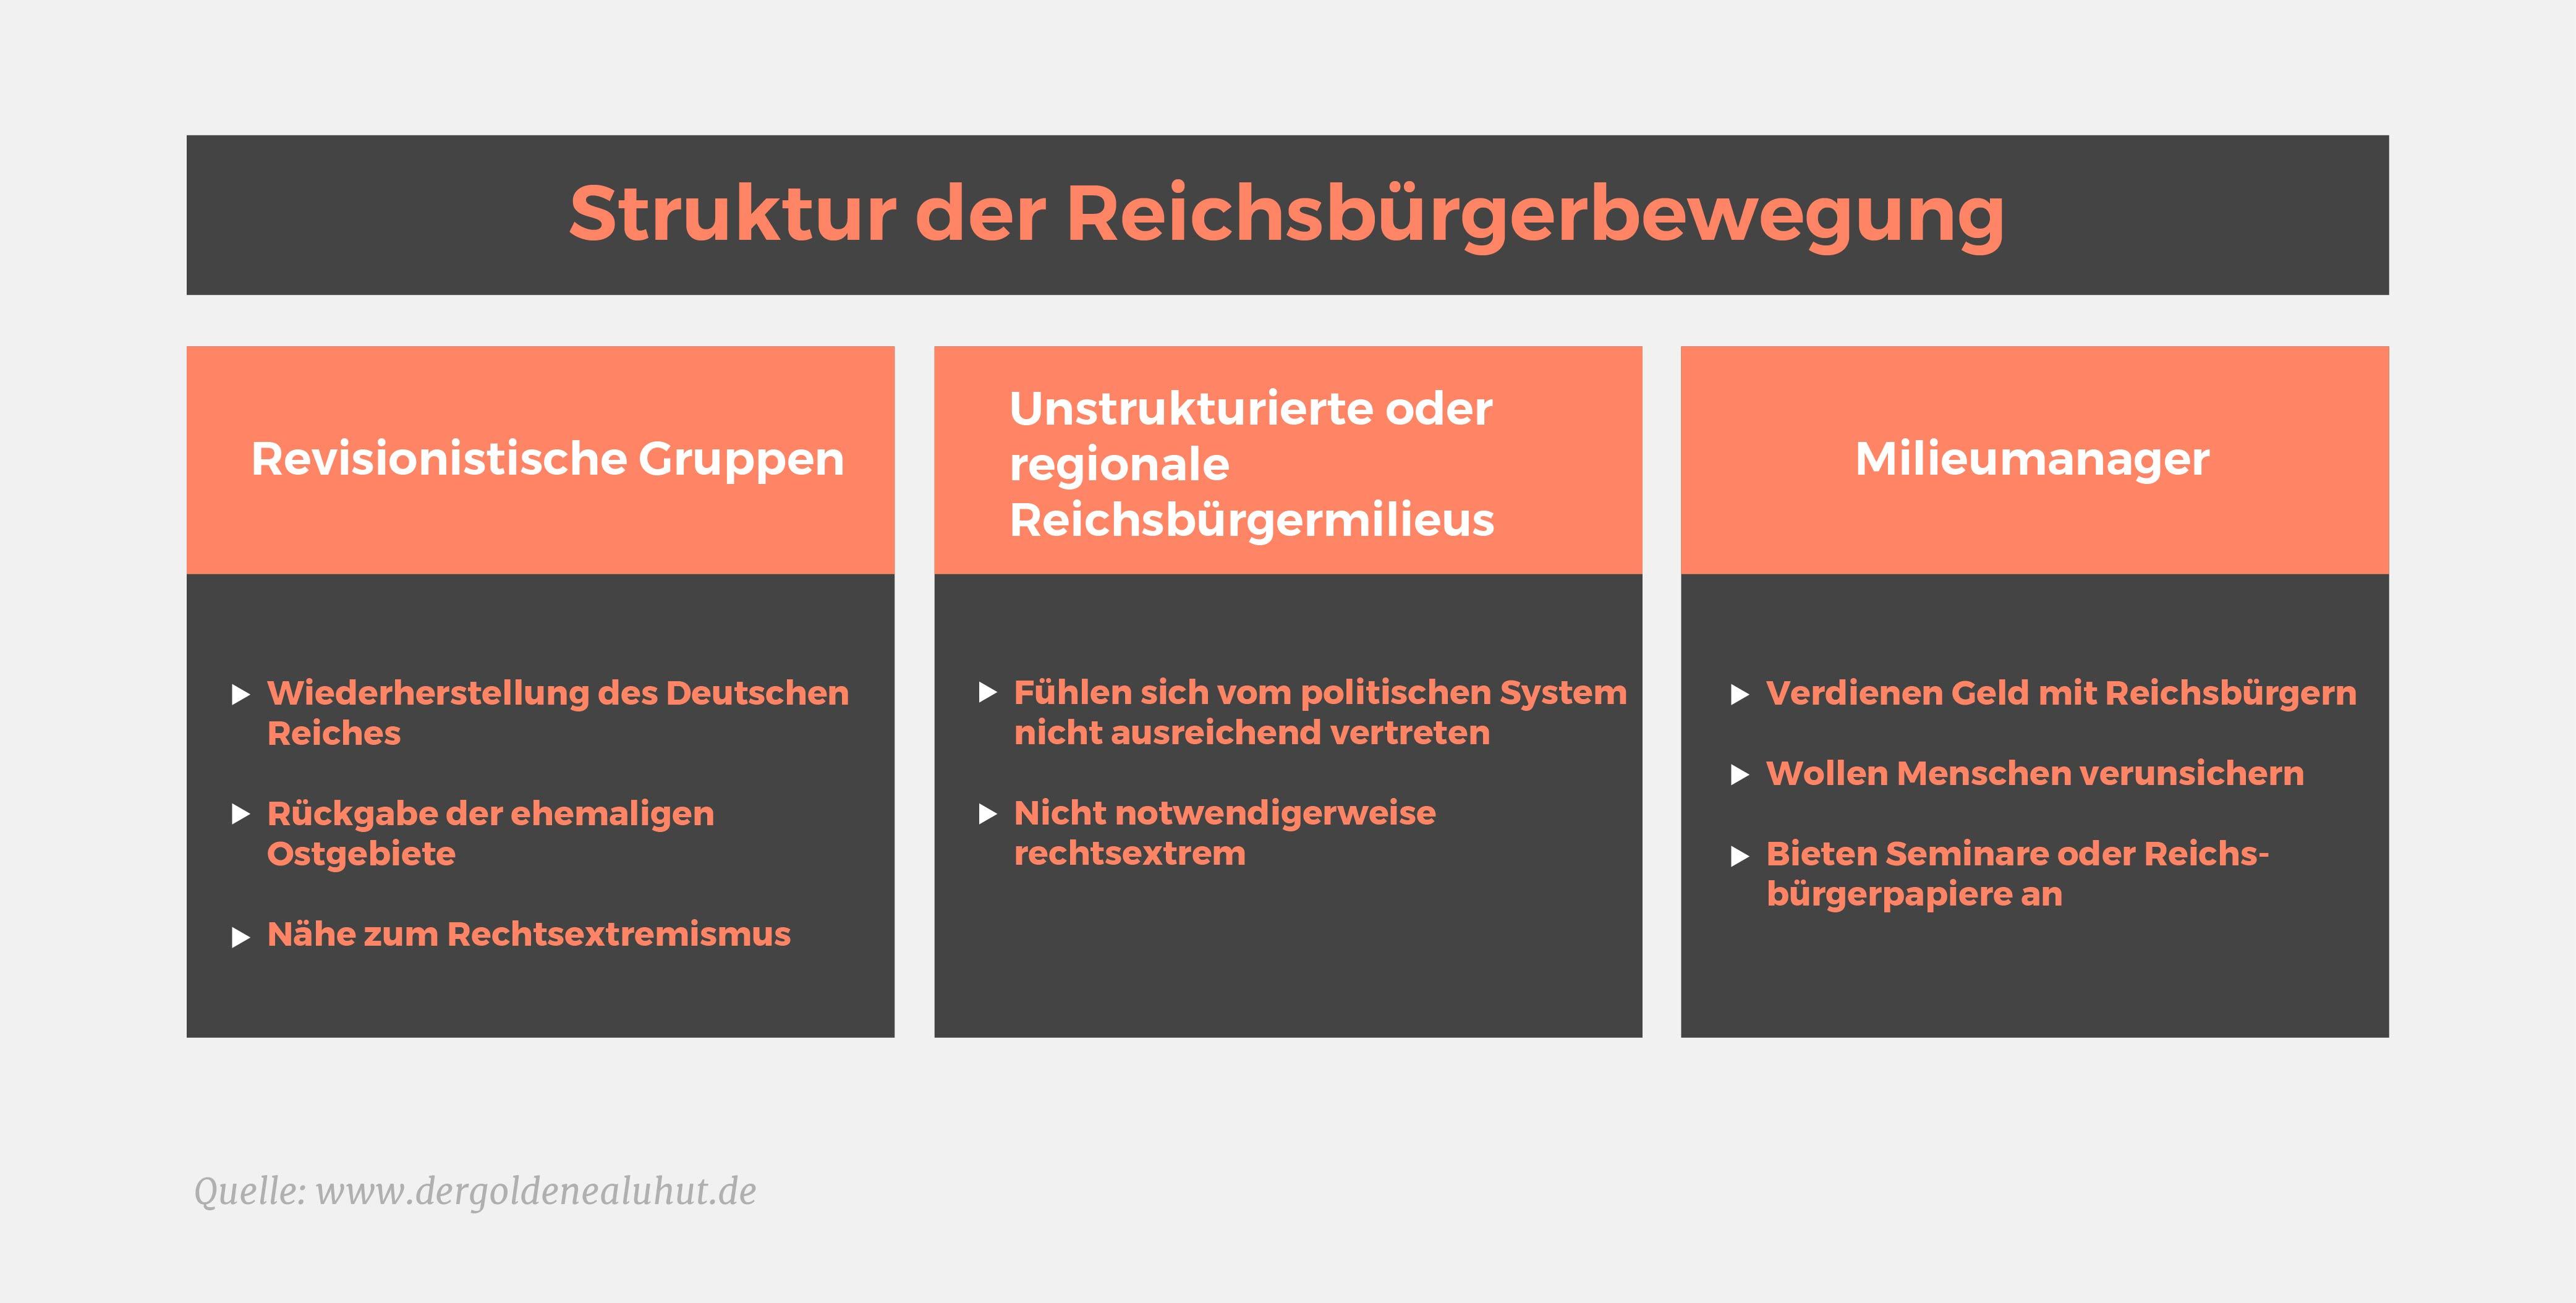 Struktur der Reichsbürgerbewegung